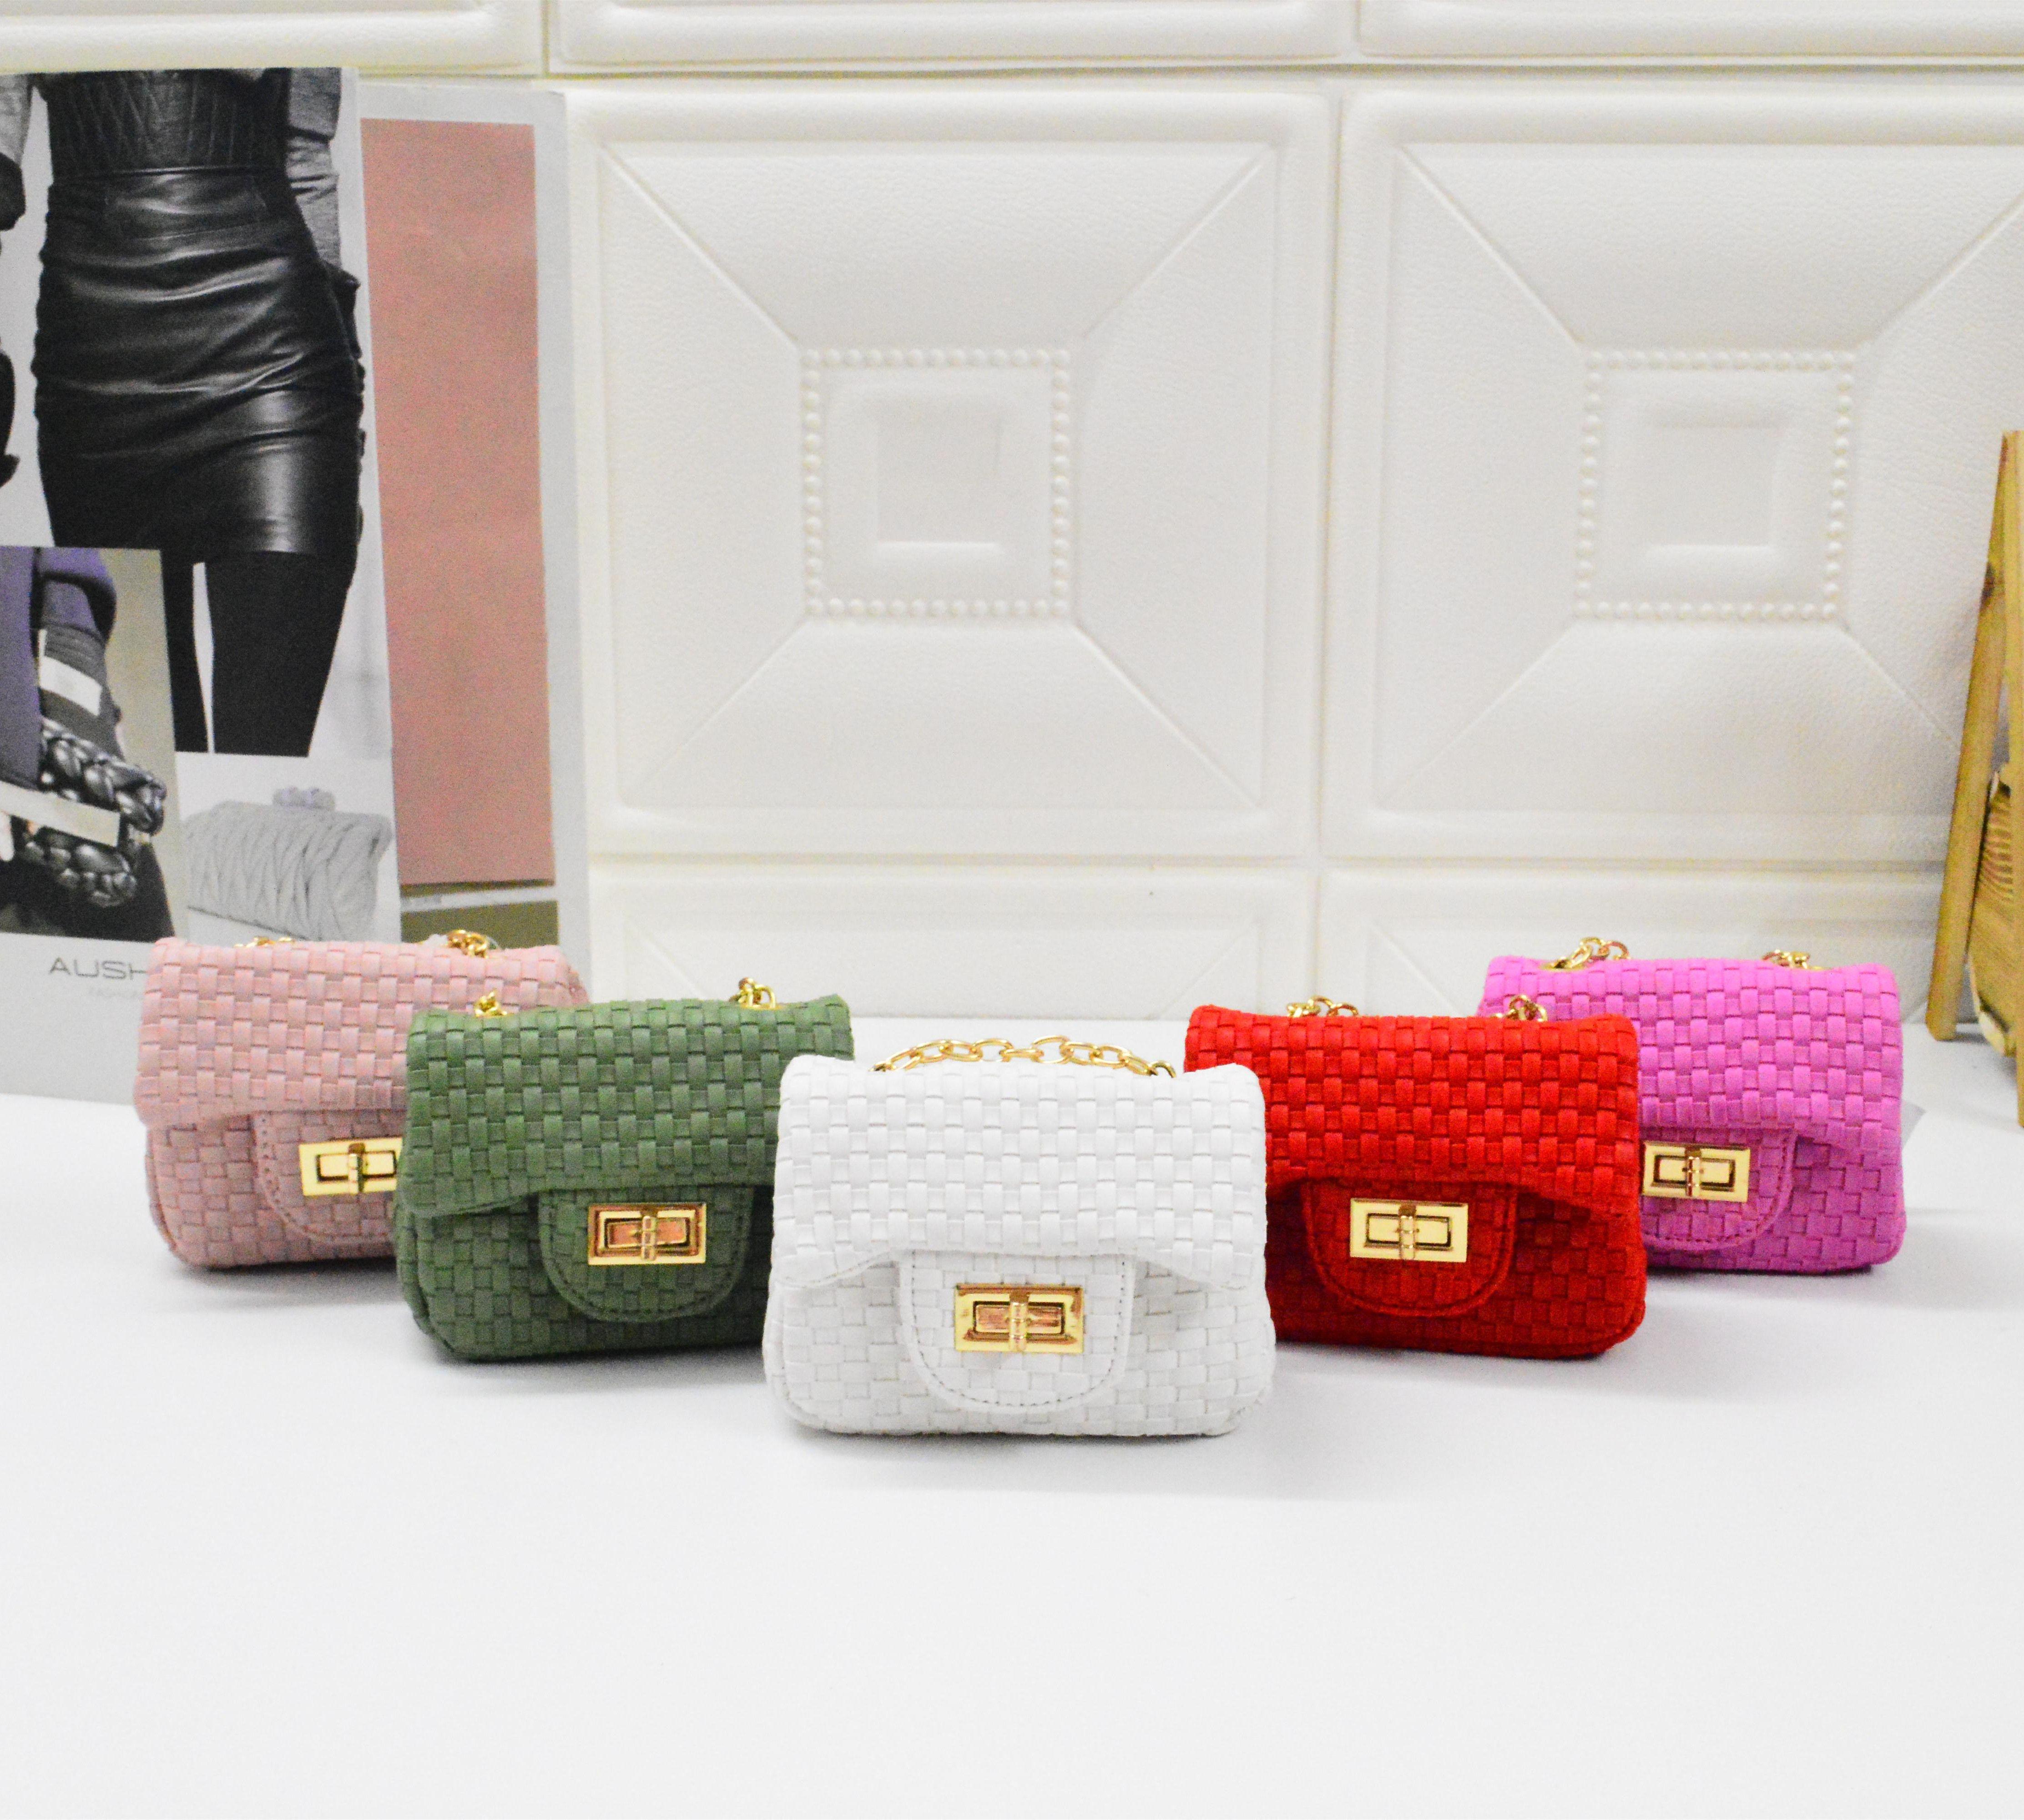 Kids Handbags 2019 Spring Summer Fashion Korean Baby Girls Mini Princess  Purses Knitted Pu Chain Cross Boay Bags Children Messenger Bags  Personalized Kids ... 703eadbd440a2